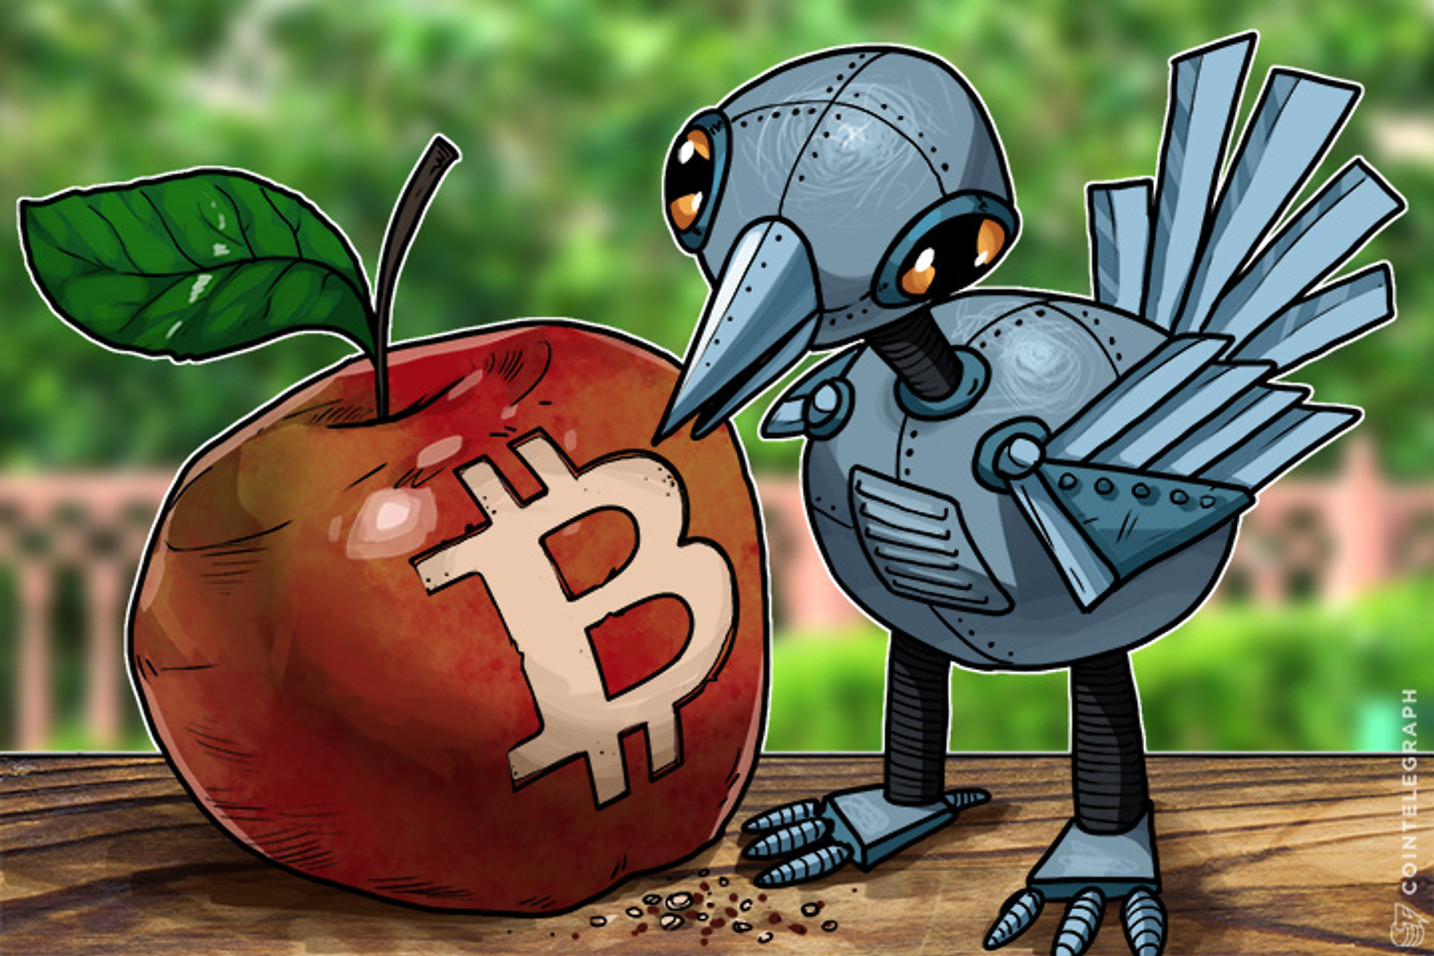 Organic Crypto Money vs. Debt Zombie's Fiat: Lessons of Biomimetics